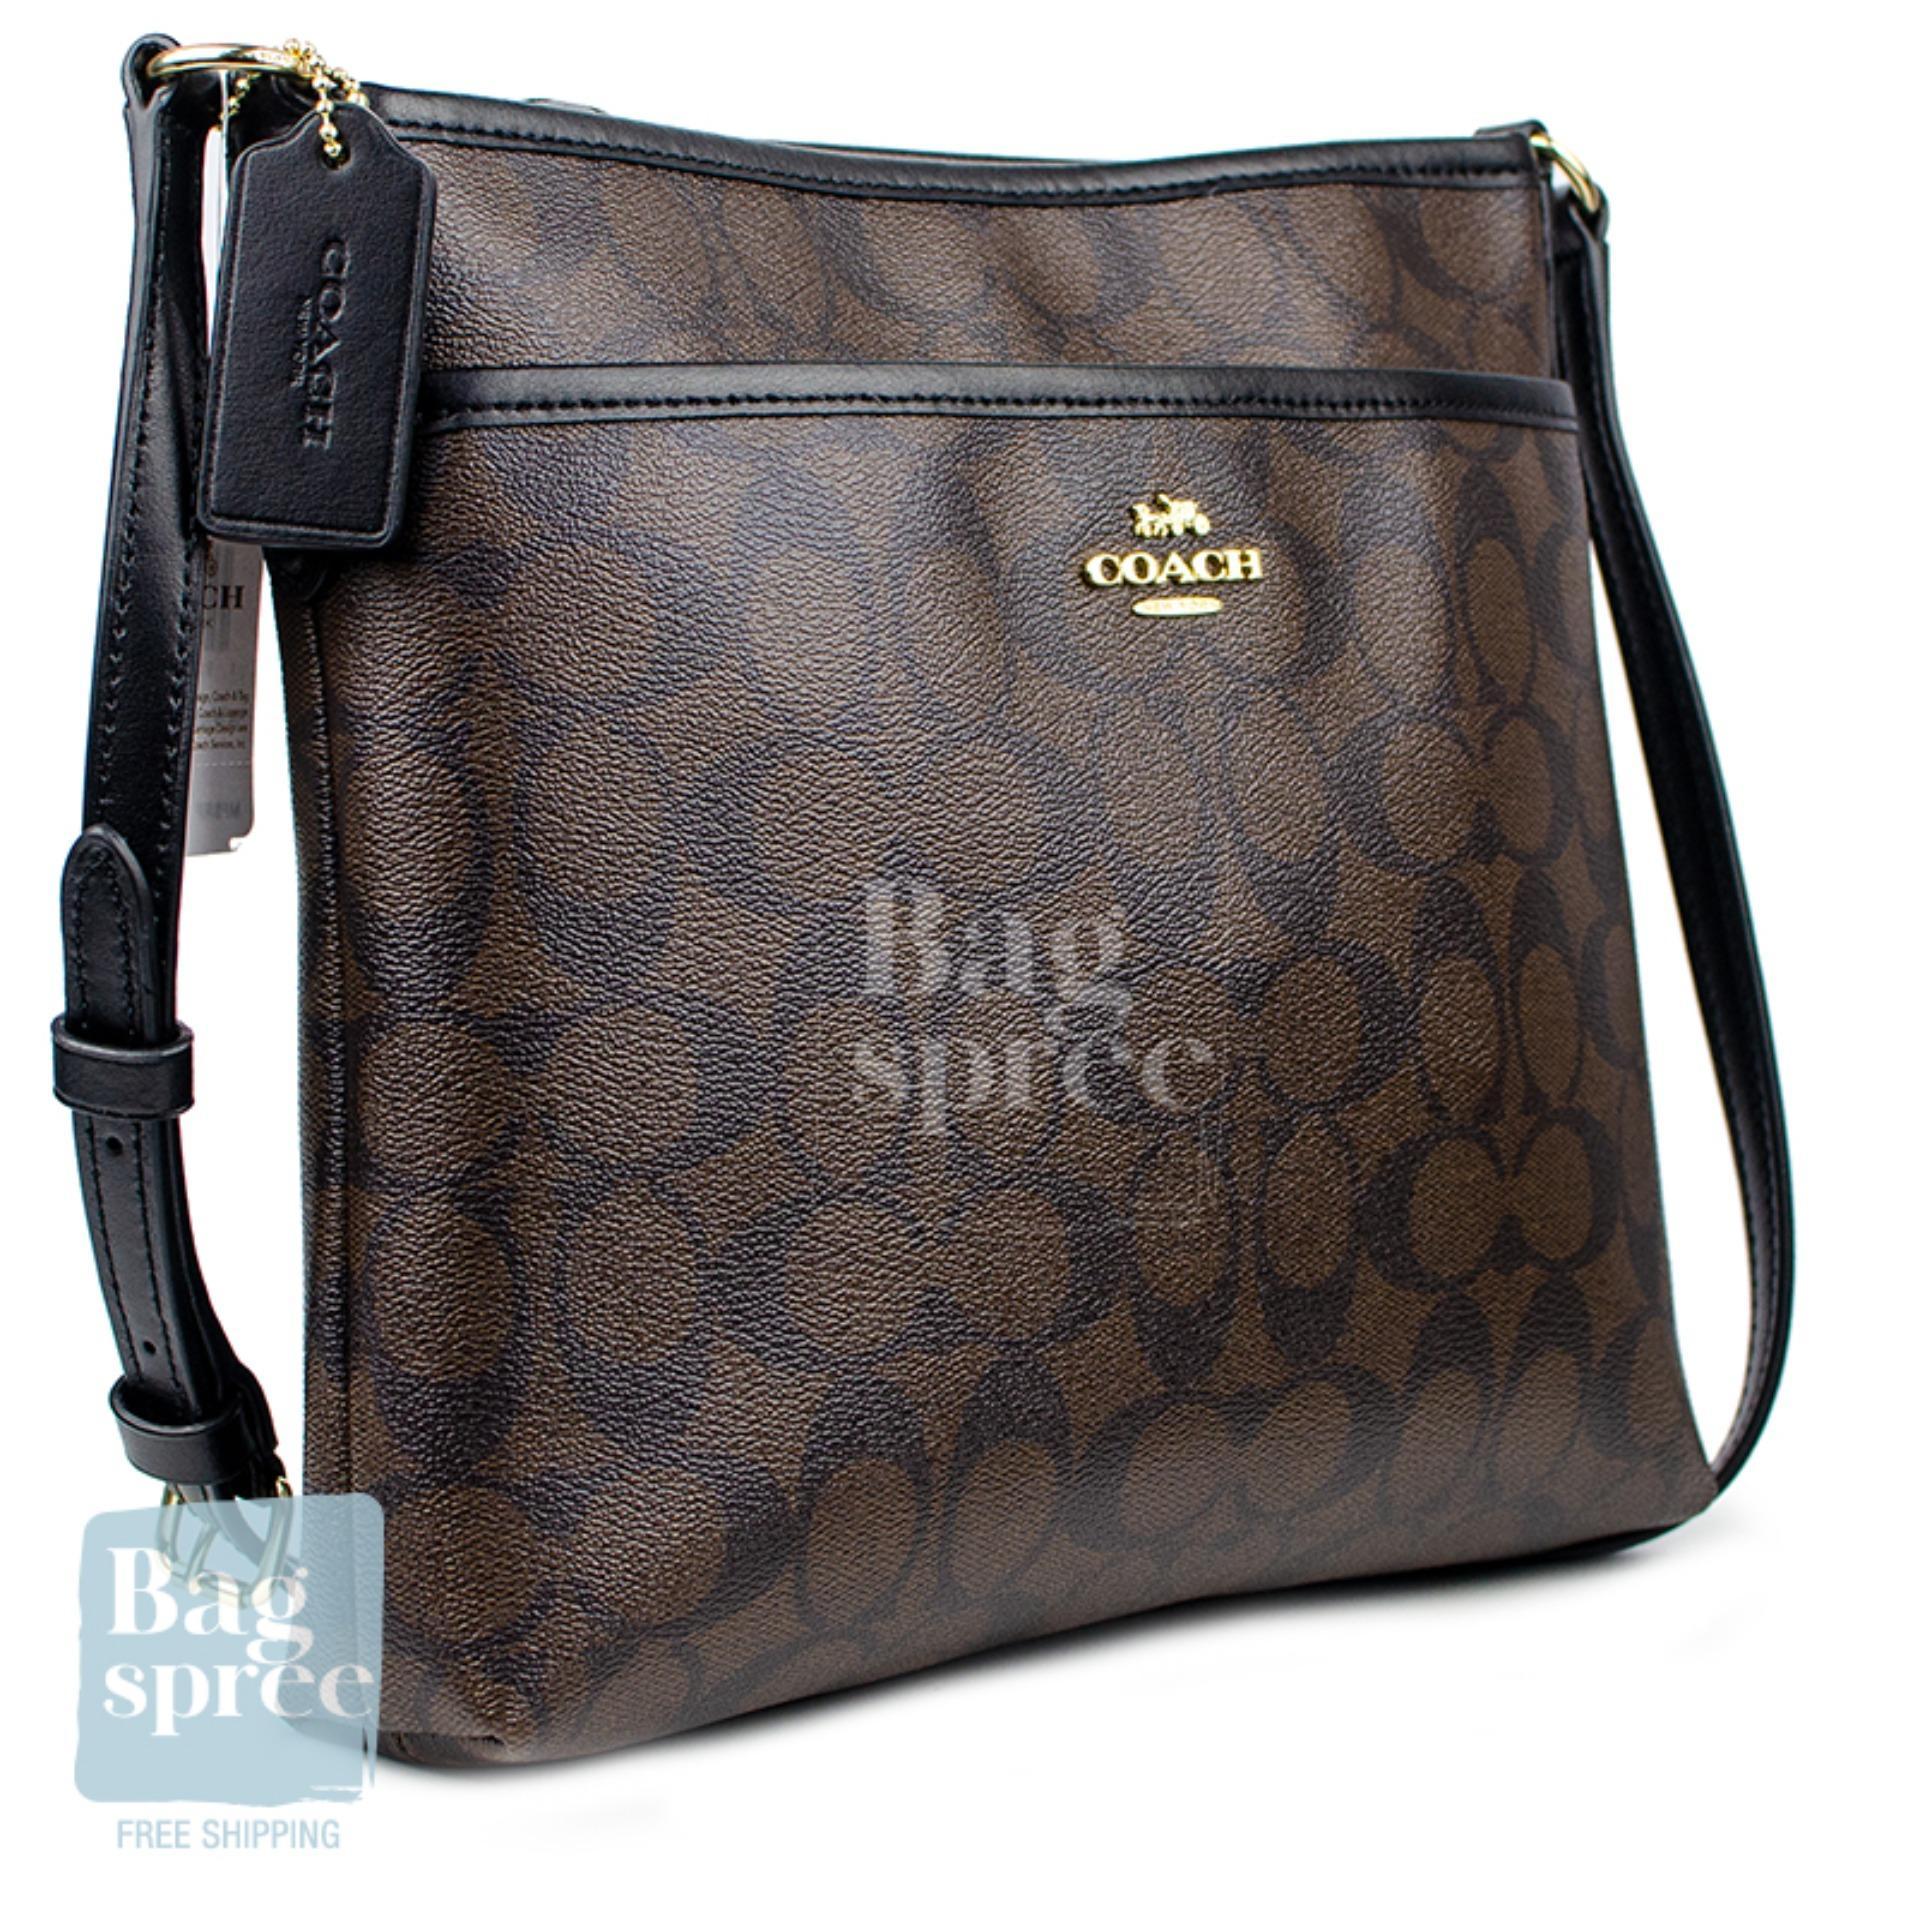 0f880e6d *Authentic & Brand New* Coach File Crossbody Canvas Bag F28035 F29210  F29960 [Gift Receipt Provided]